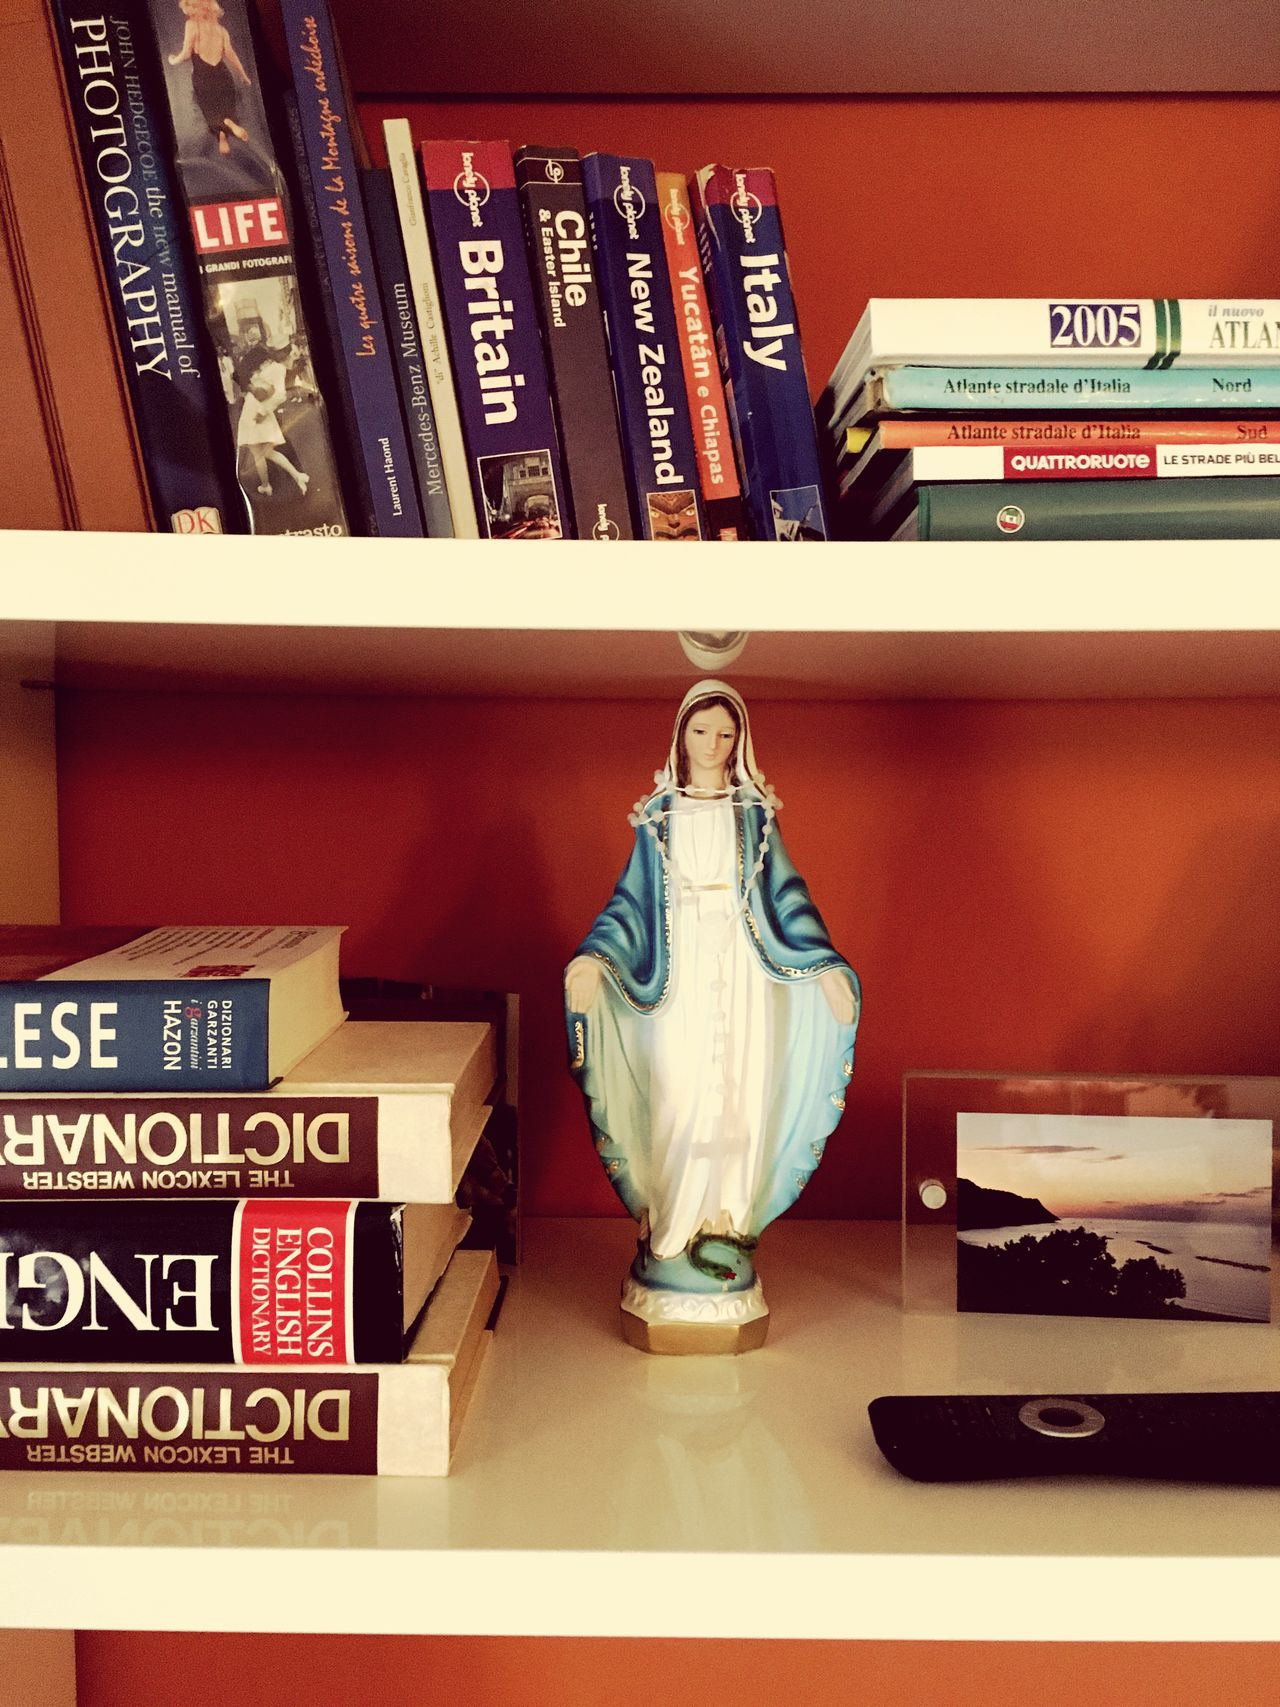 Book Statue Indoors  Bookshelf Sculpture Mary Maria spiritual Religion Spirituality Human Representation Literature Shelf No People Day